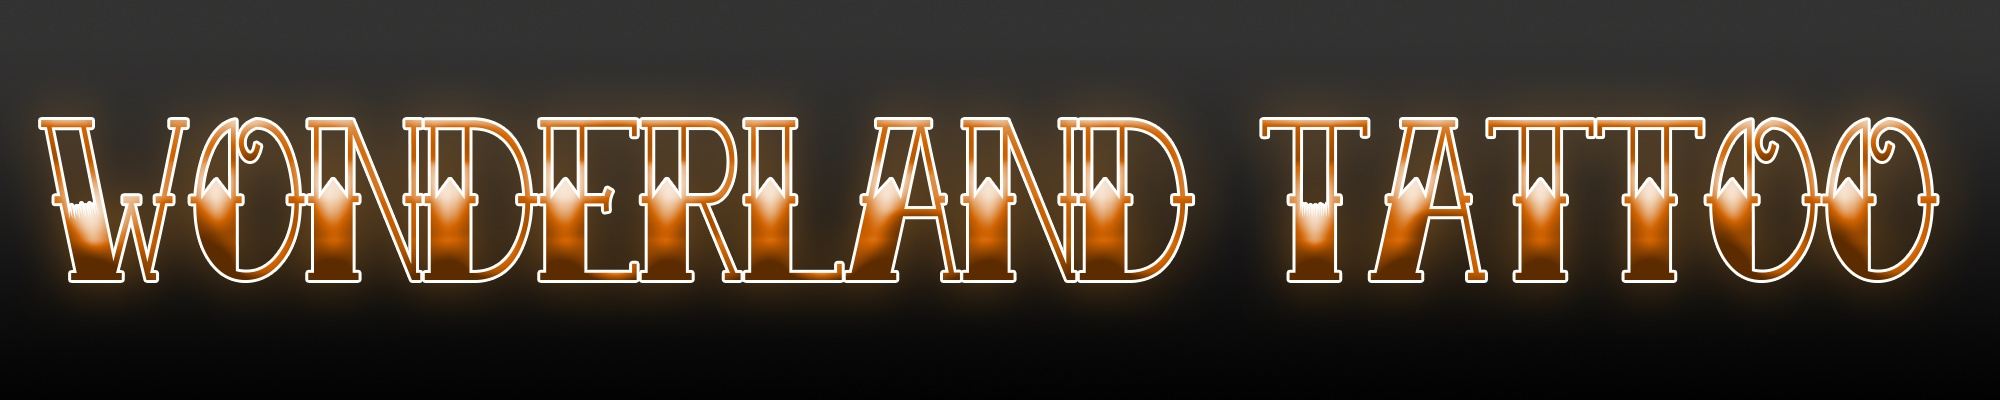 wonderlandtattoostudio Cover